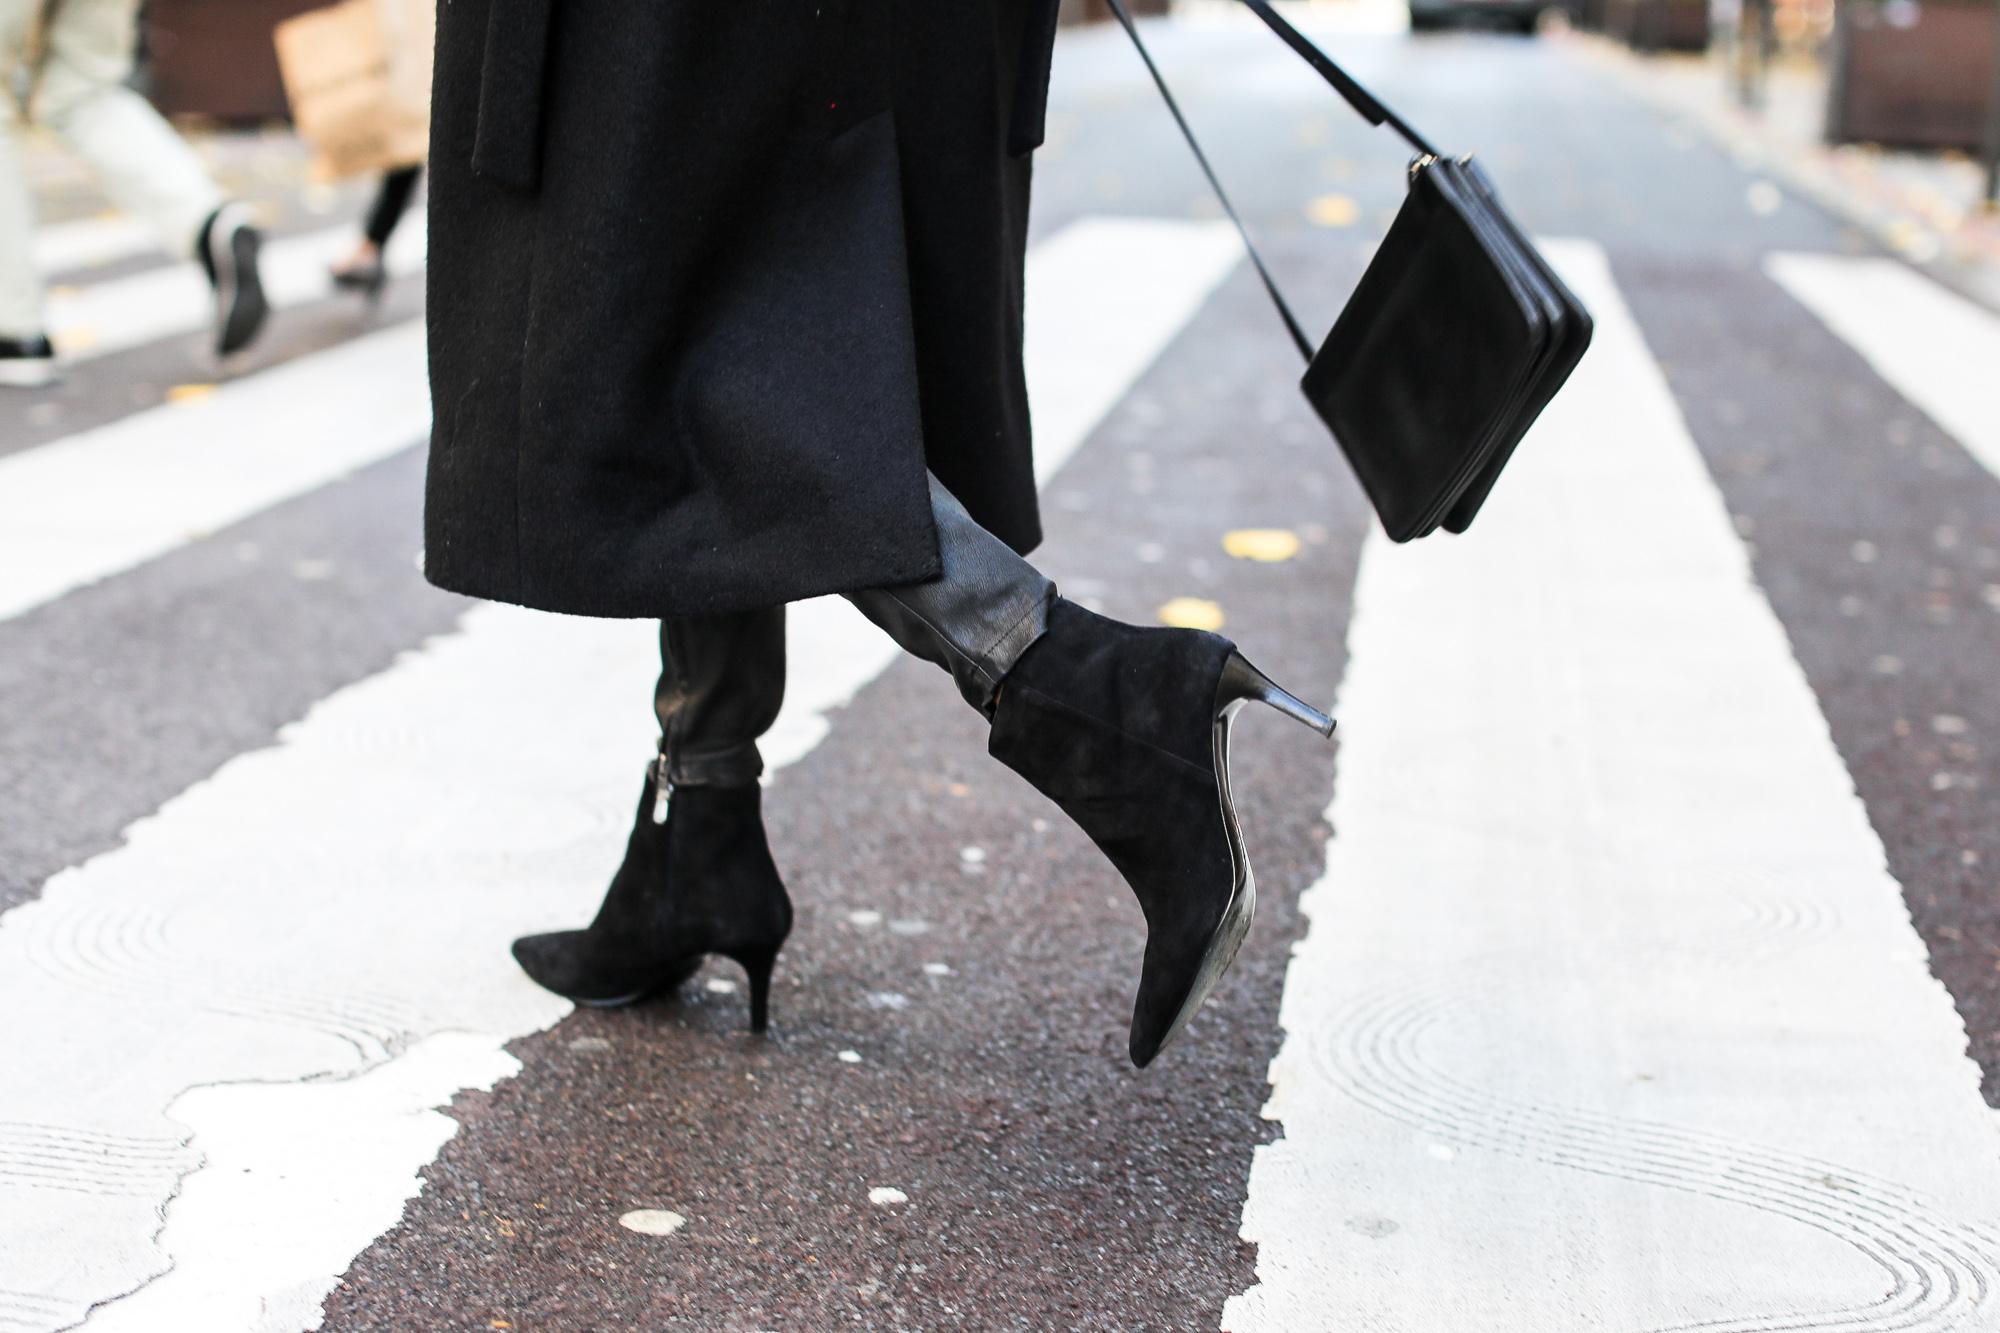 Clochet_fashionblogger_streetstyle_claudiepierlot_stripedknit_andotherstories_suedestilettoankleboots_coslongwoolcoat